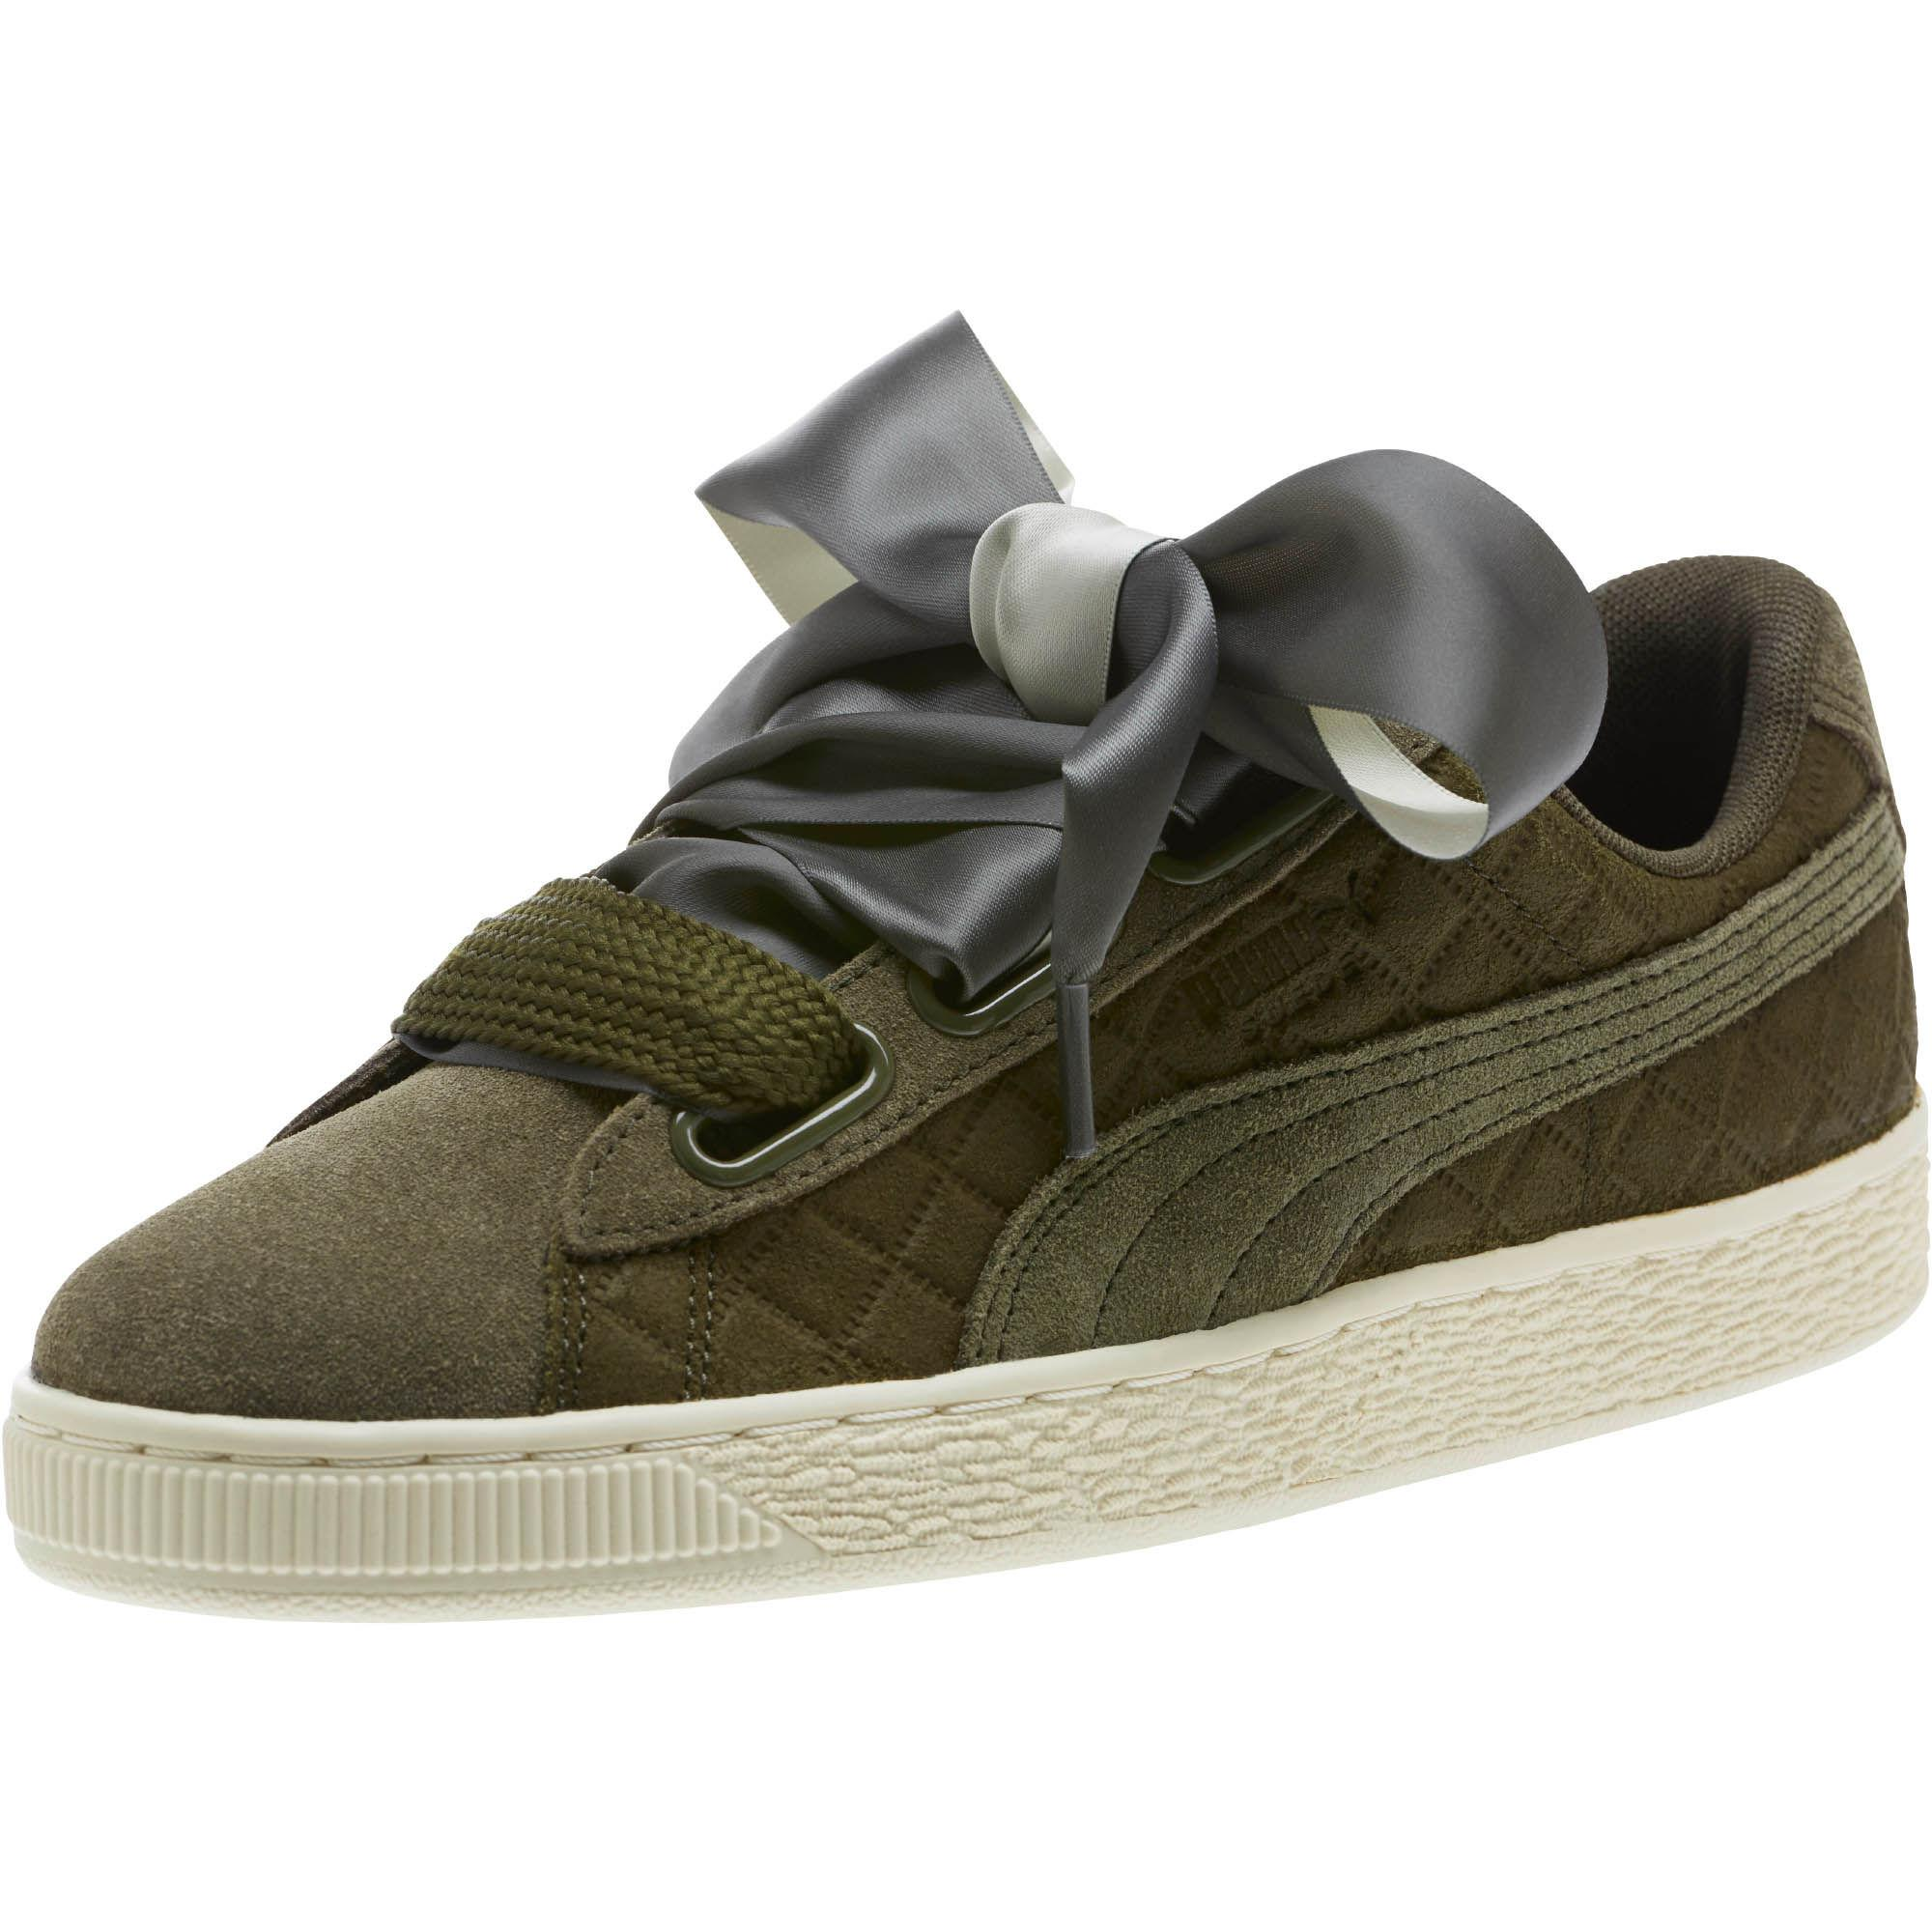 181b5061cc2fd6 Lyst - PUMA Suede Heart Quilt Women s Sneakers in Green